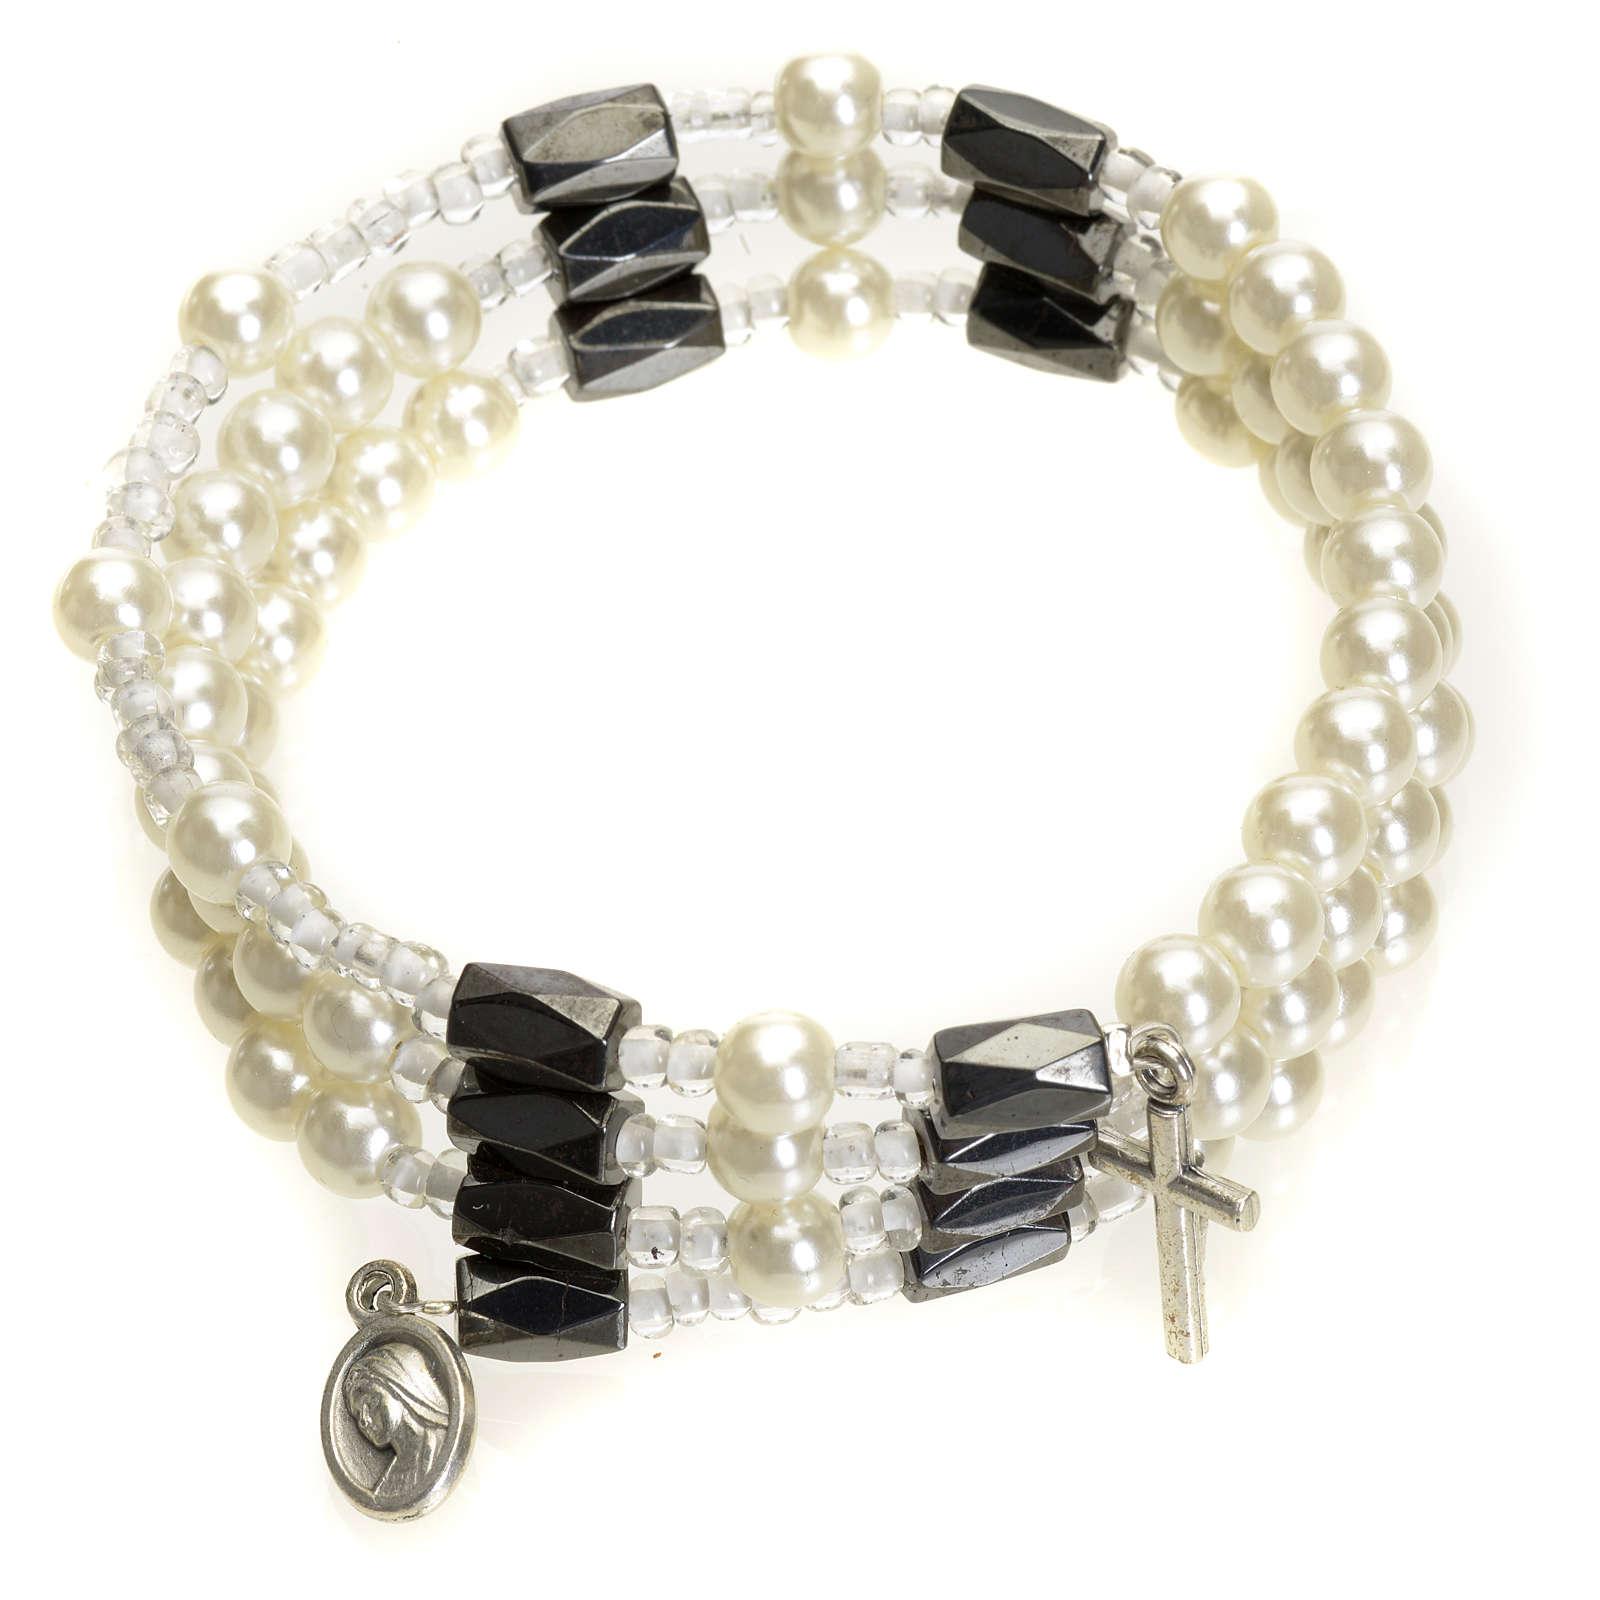 Brazalete rosario Medjugorje perlas blancas 4